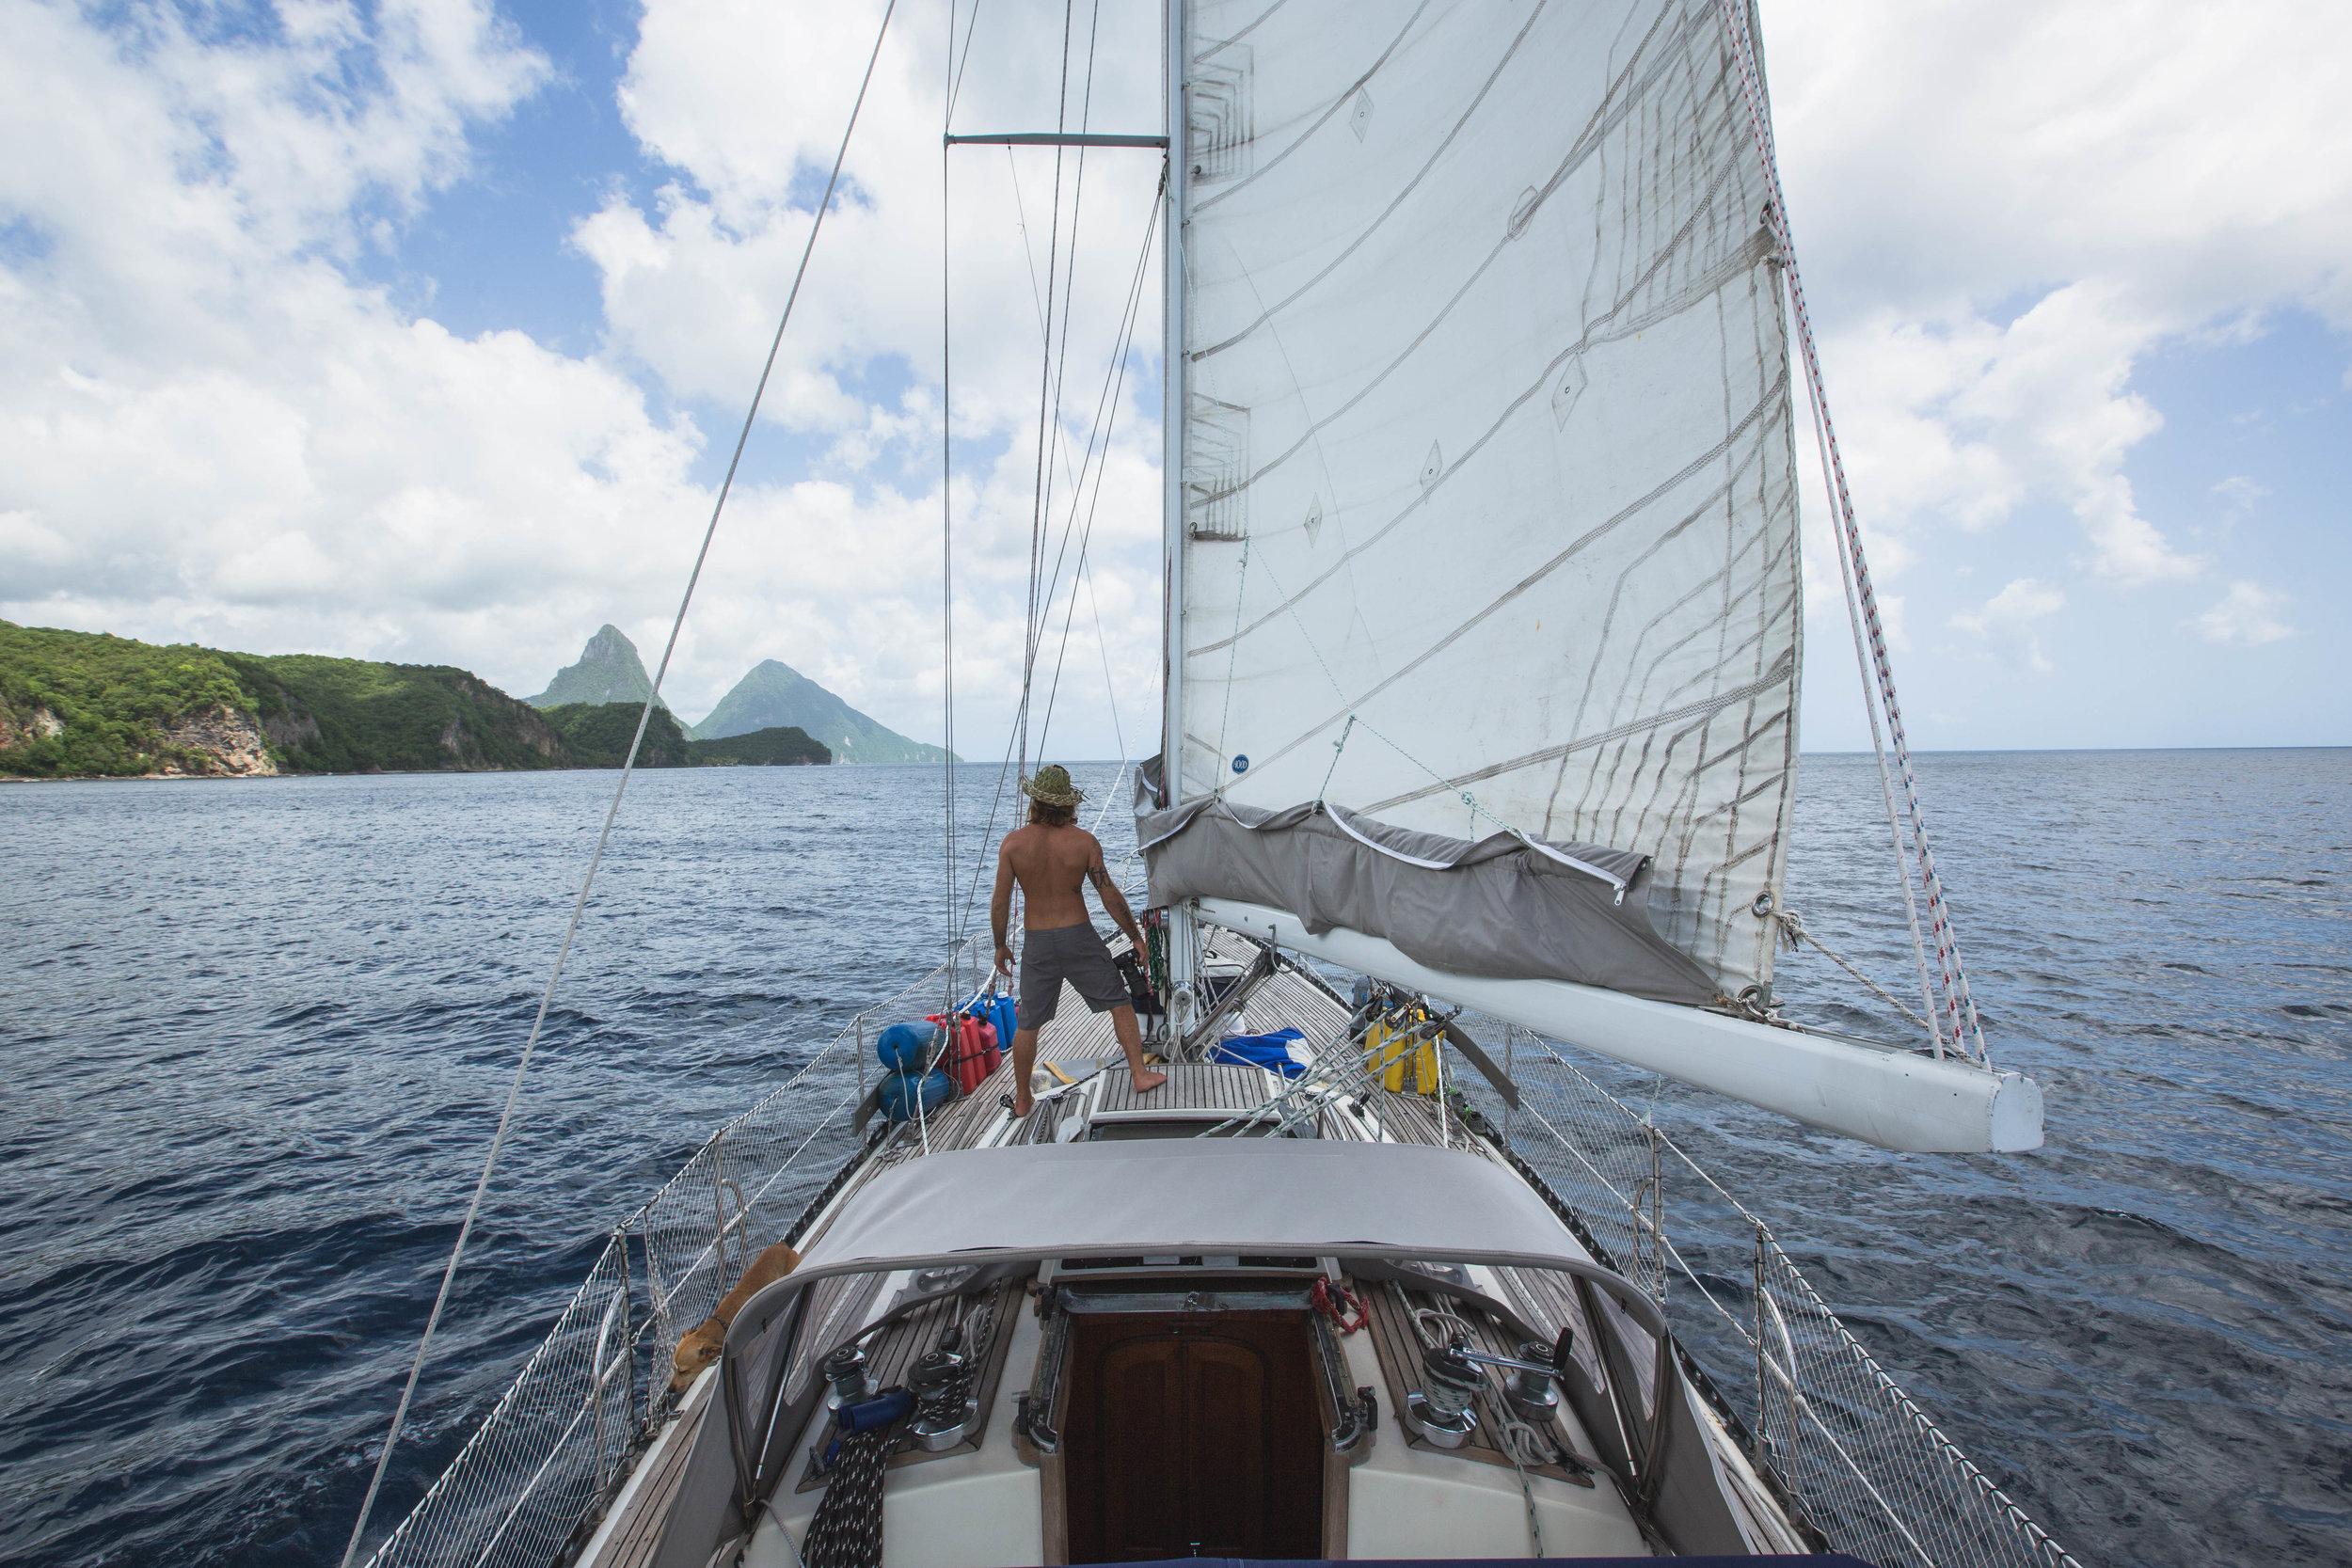 Dominica-20160622-2-.jpg